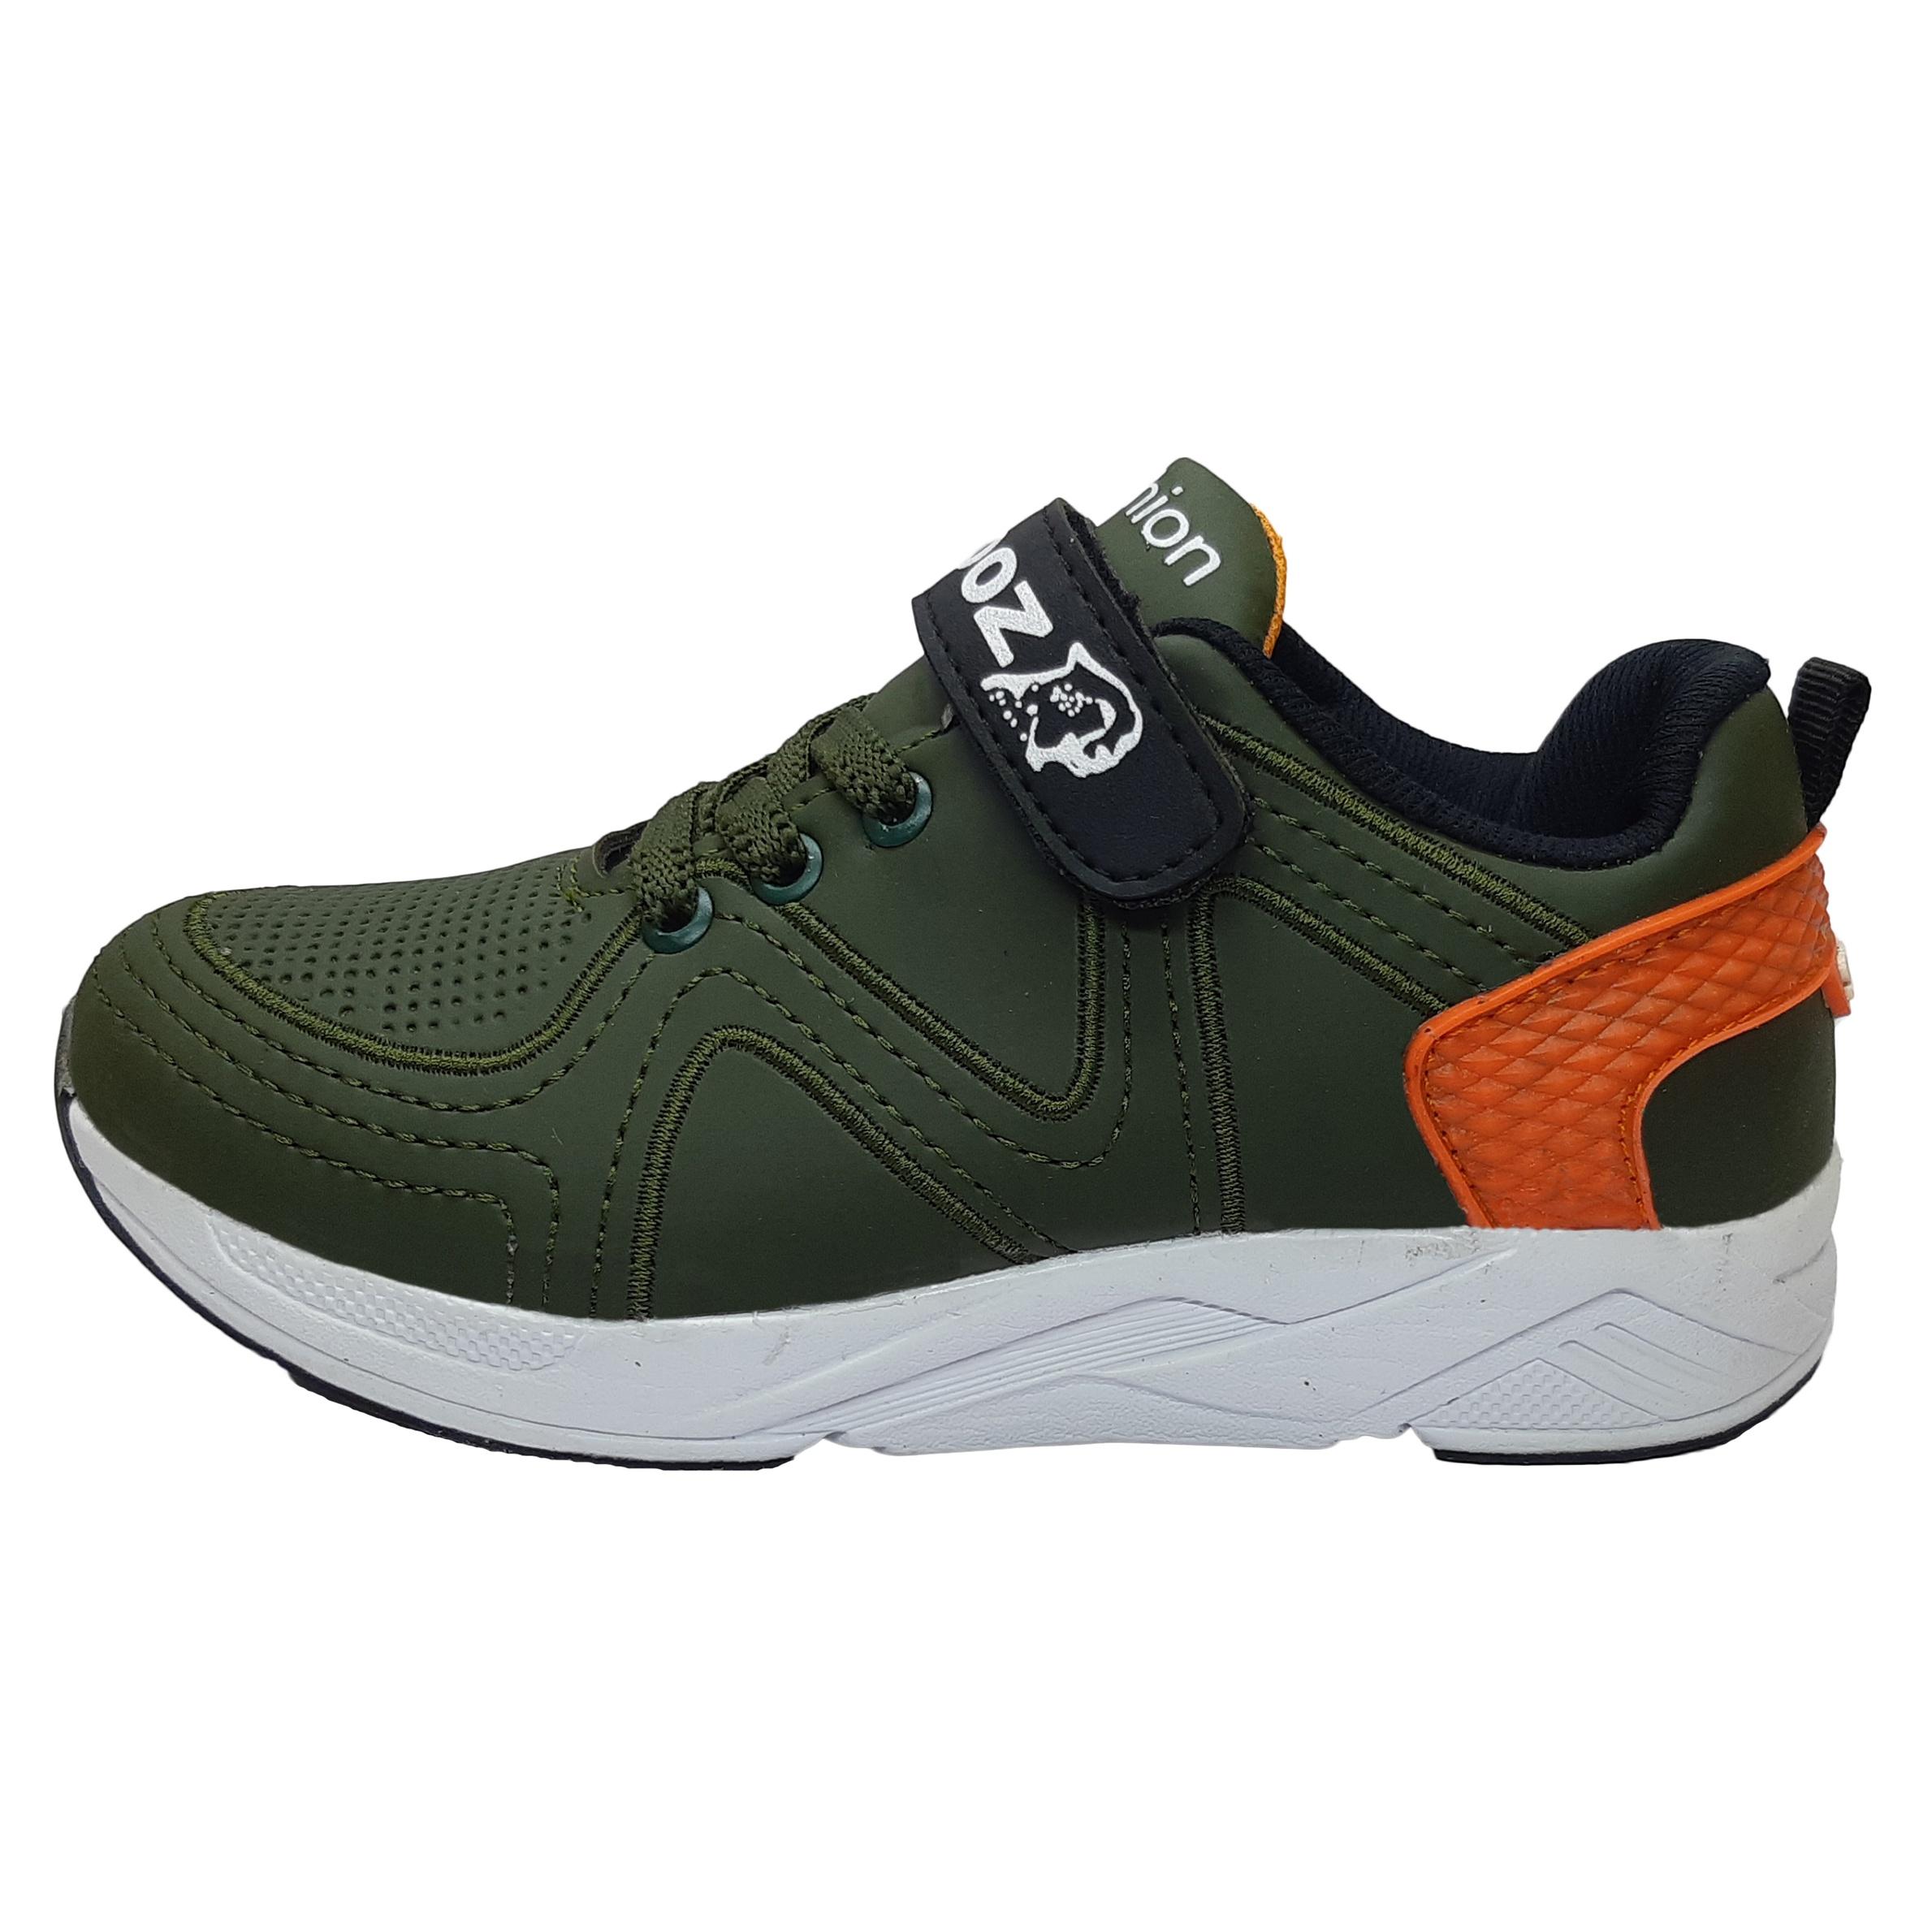 کفش راحتی پسرانه کد 3142